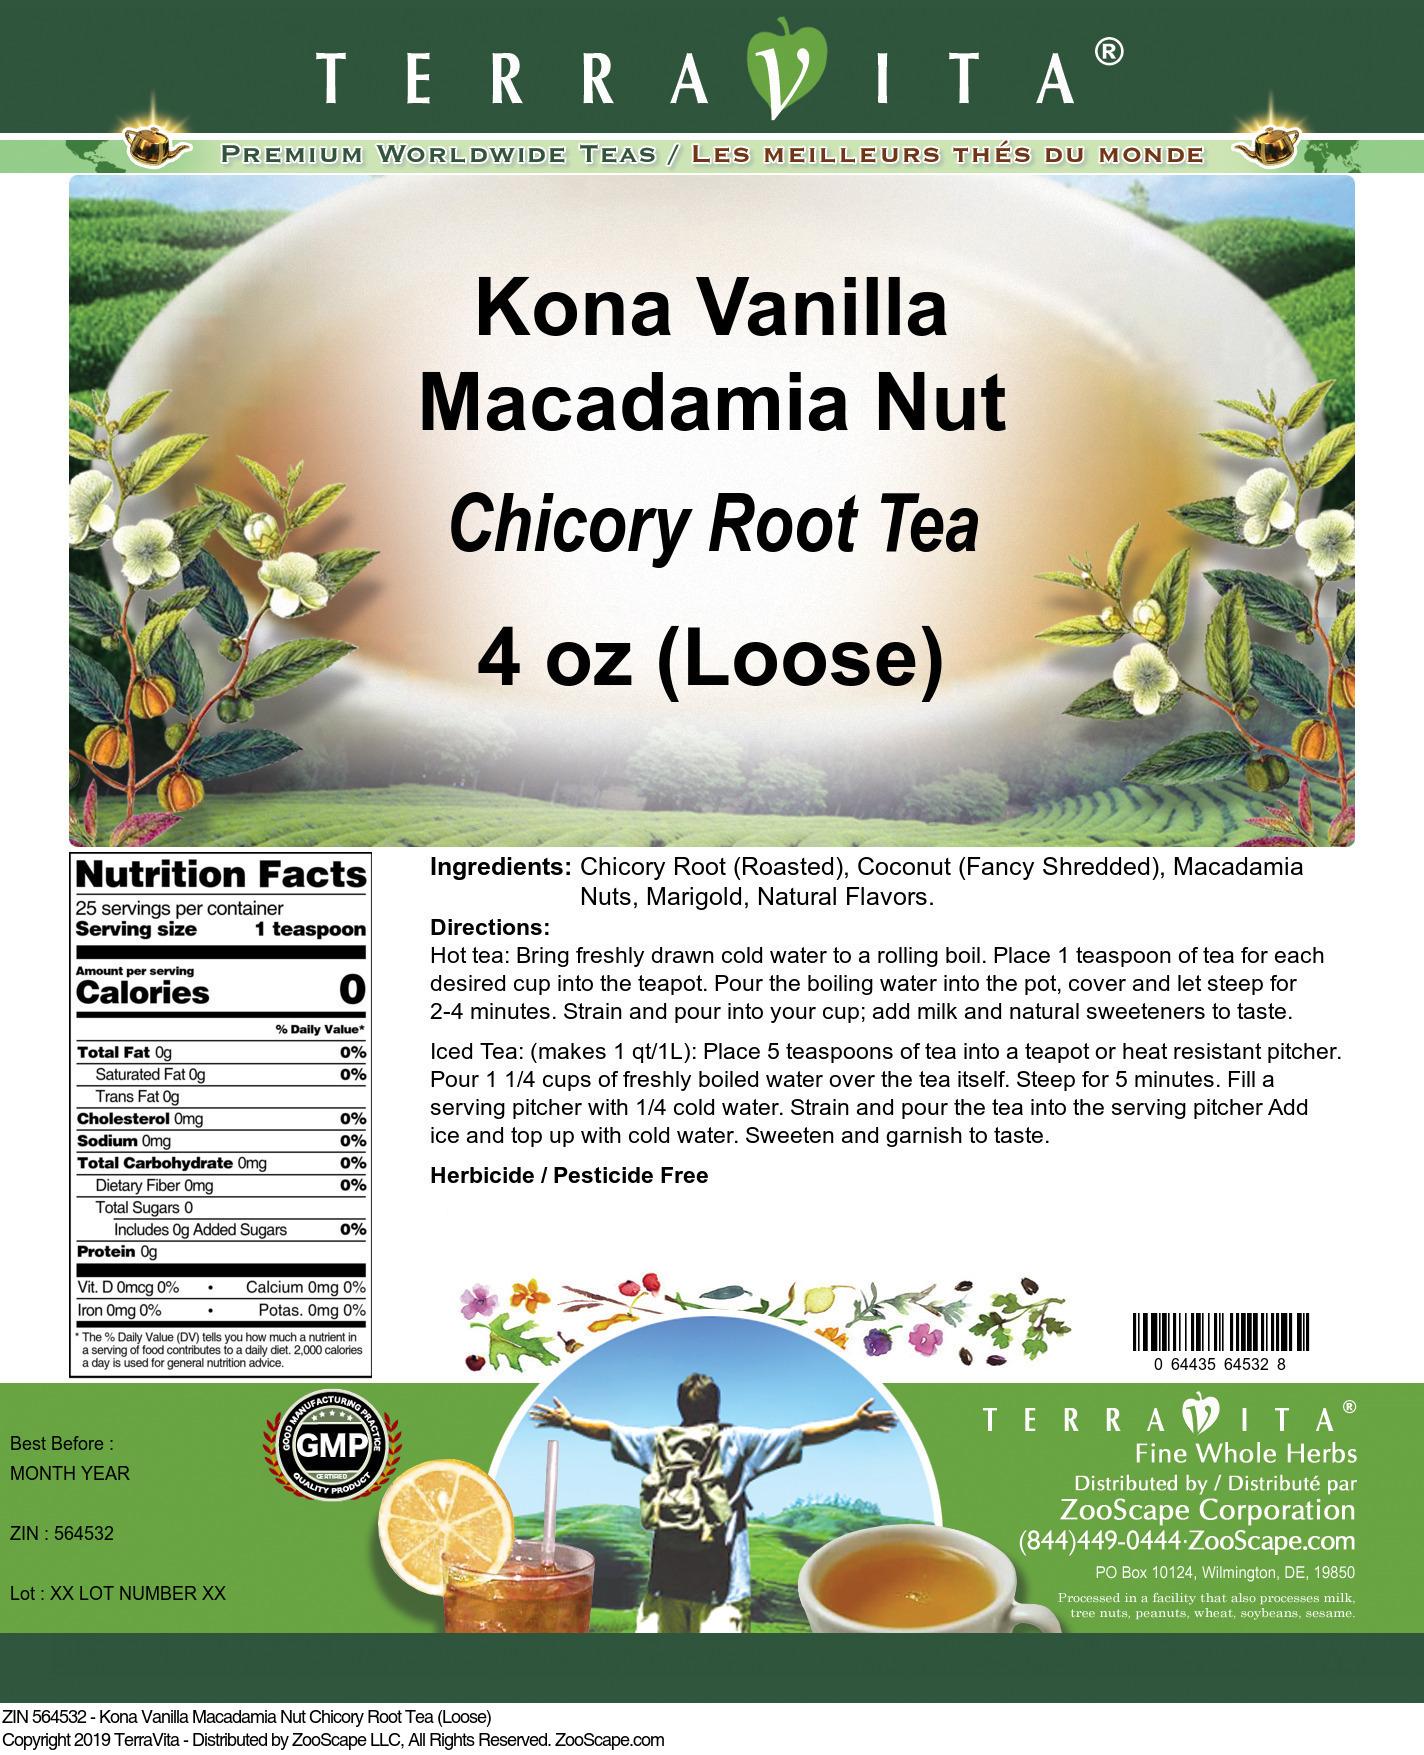 Kona Vanilla Macadamia Nut Chicory Root Tea (Loose)